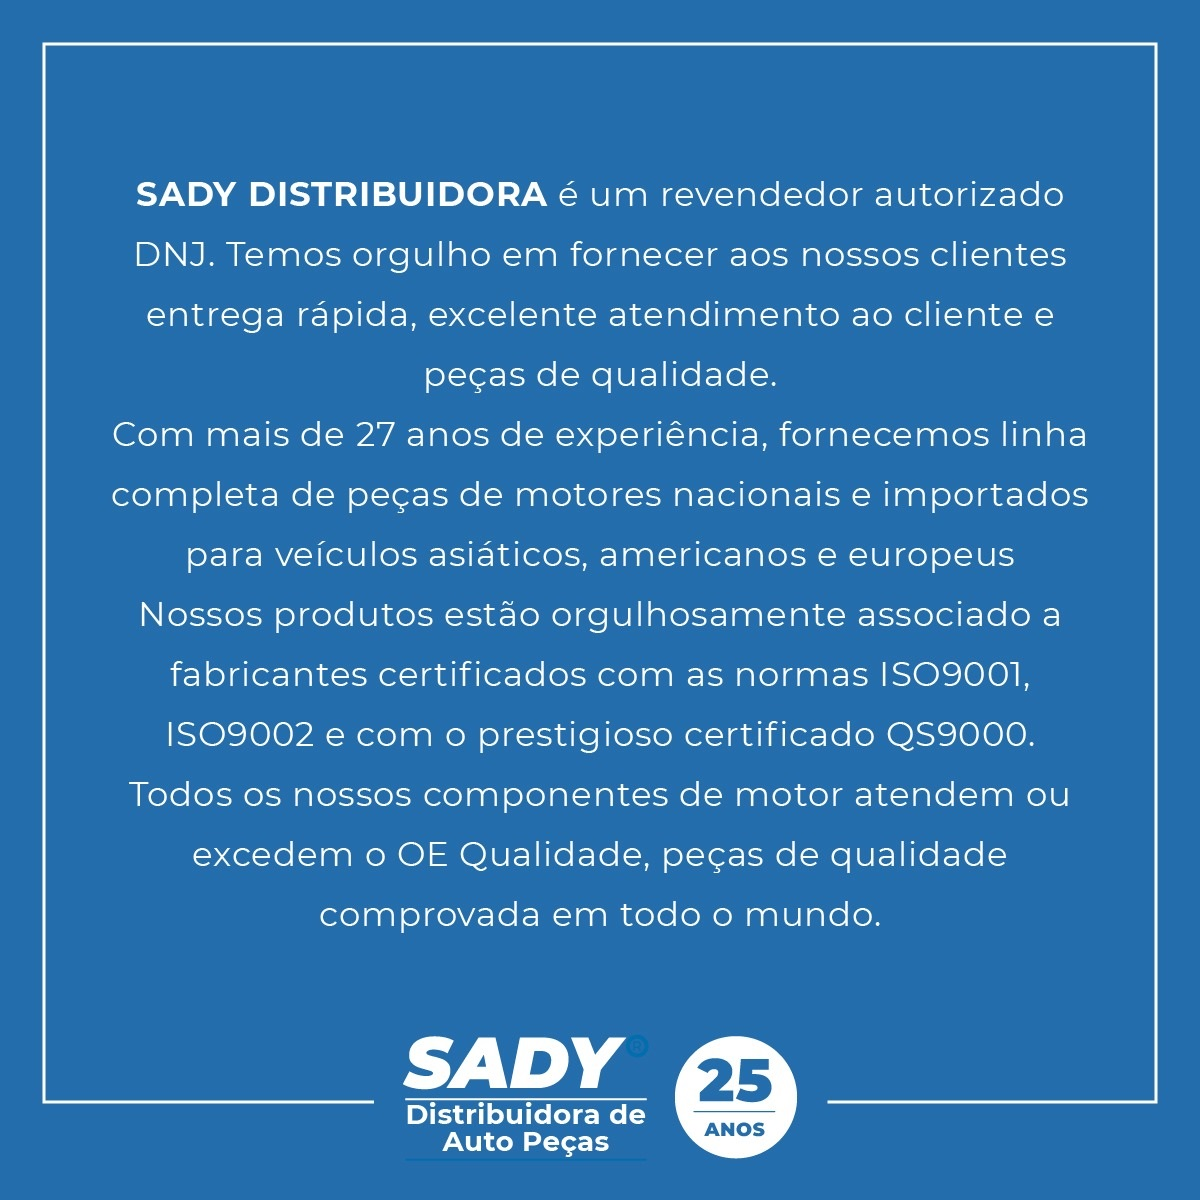 BOMBA DE OLEO DO MOTOR KIA 2.9 16V